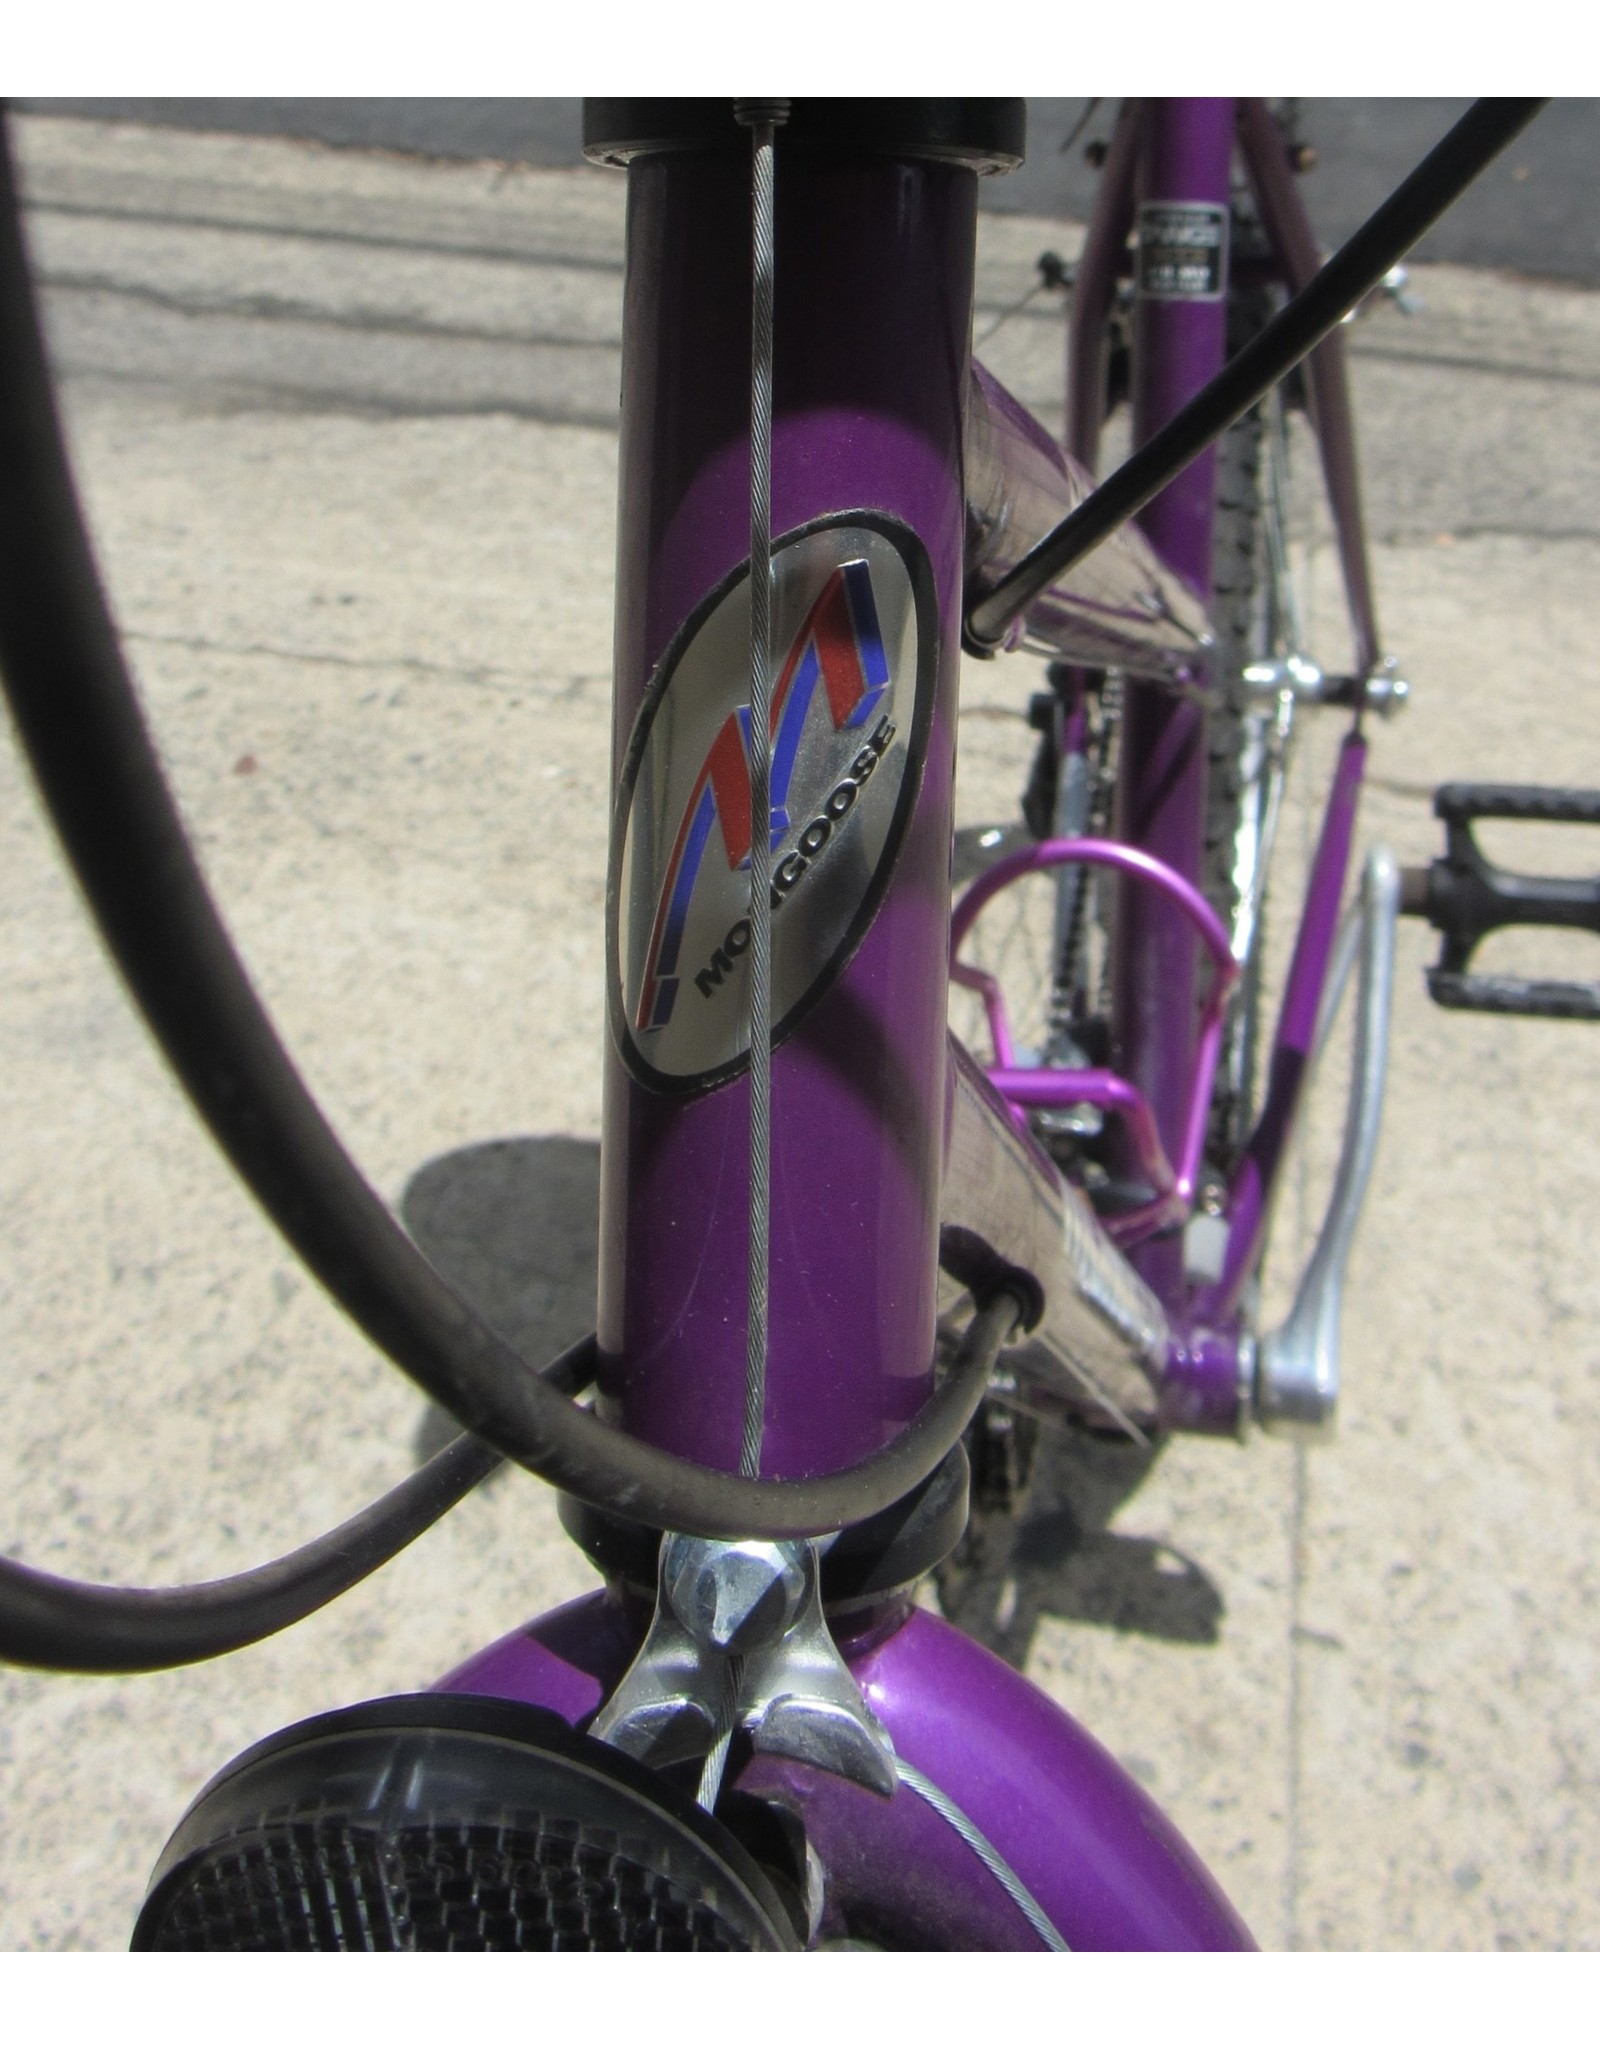 Mongoose Mongoose Switchback, Vintage 19 inch, Purple